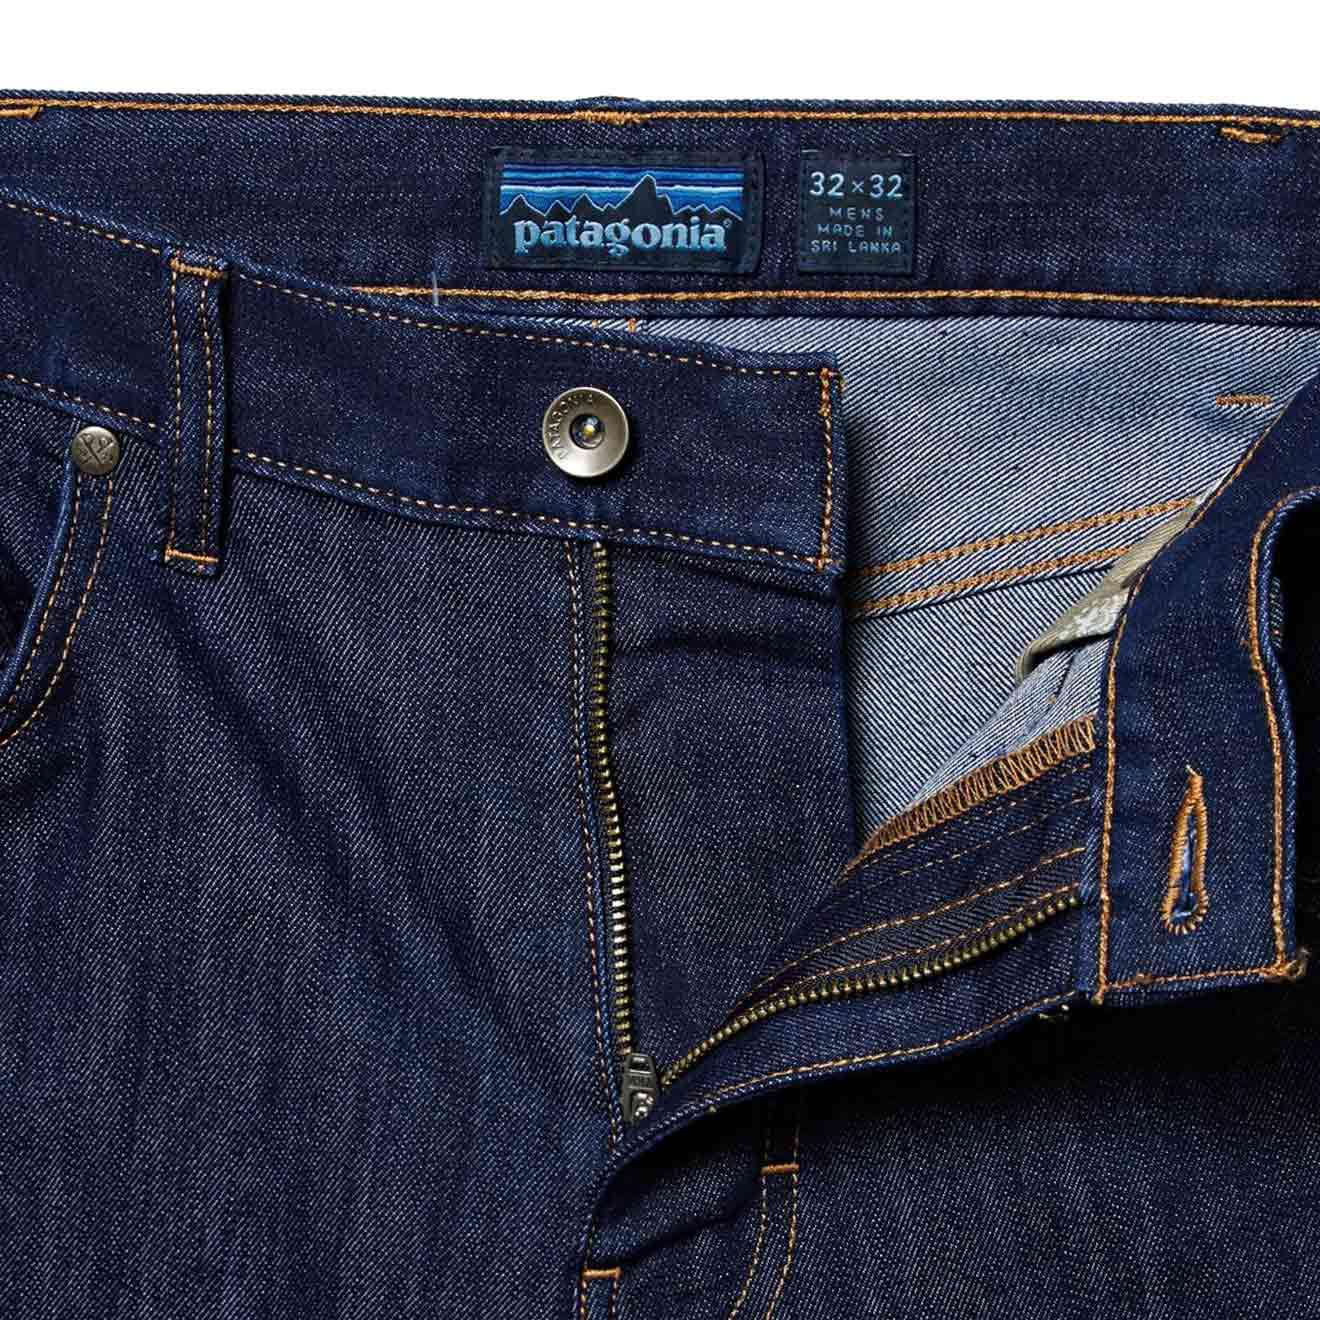 sports shoes 05877 08a80 Patagonia Performance Regular Fit Jeans Reg Dark Denim - The Sporting Lodge